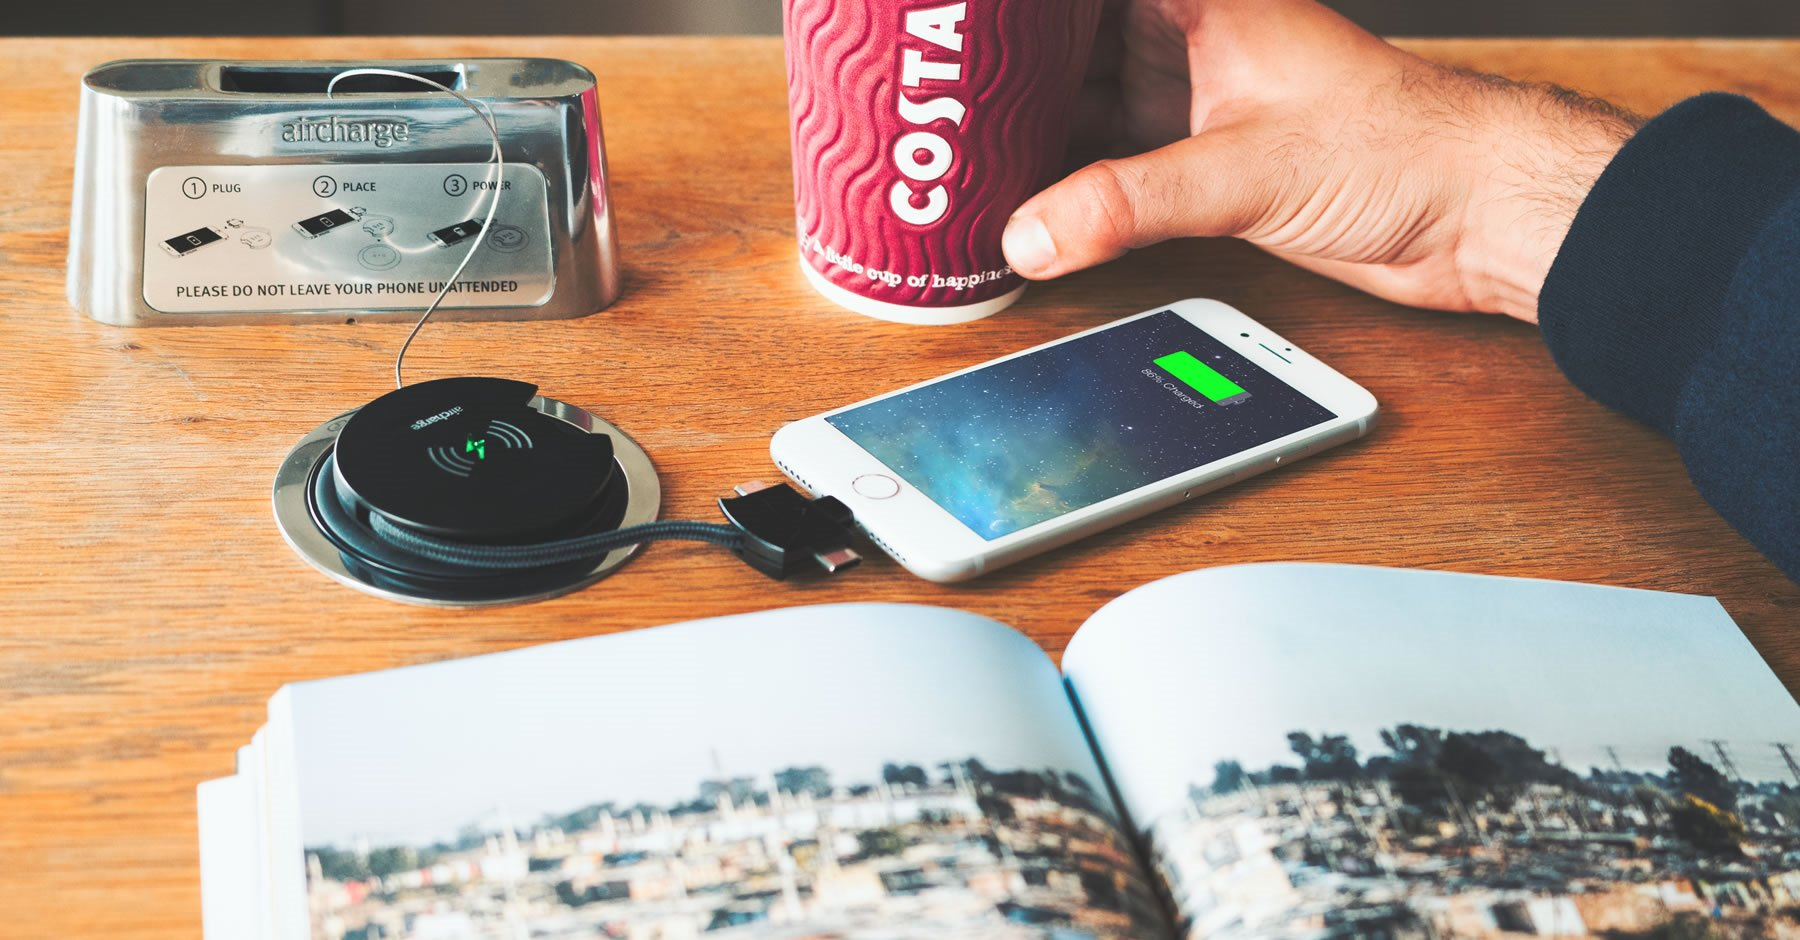 Trådlös laddning på kafé